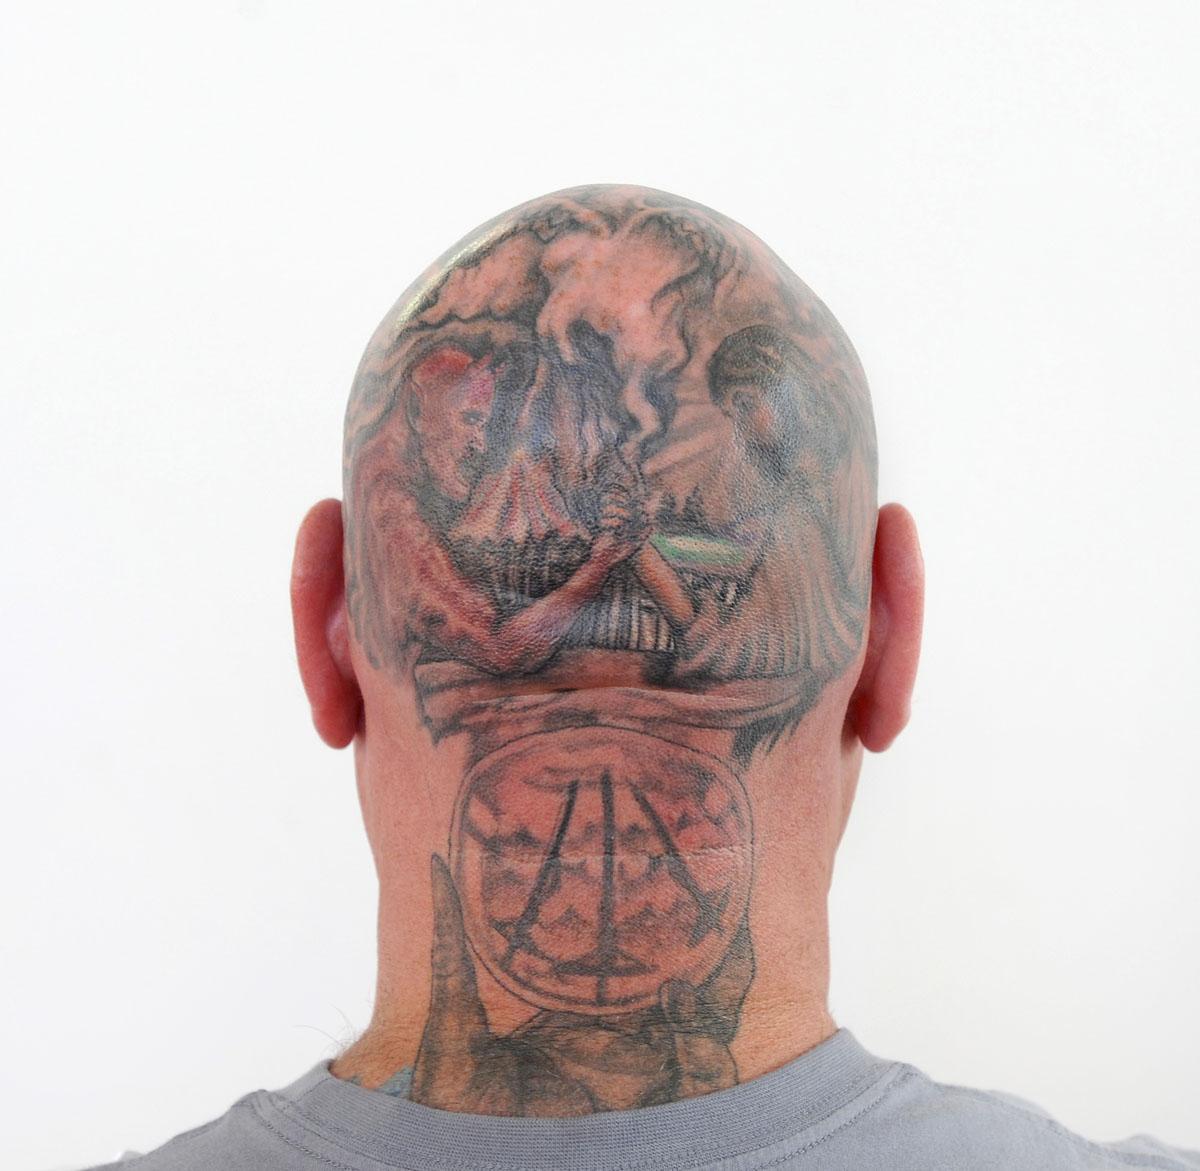 neon_tattoo06